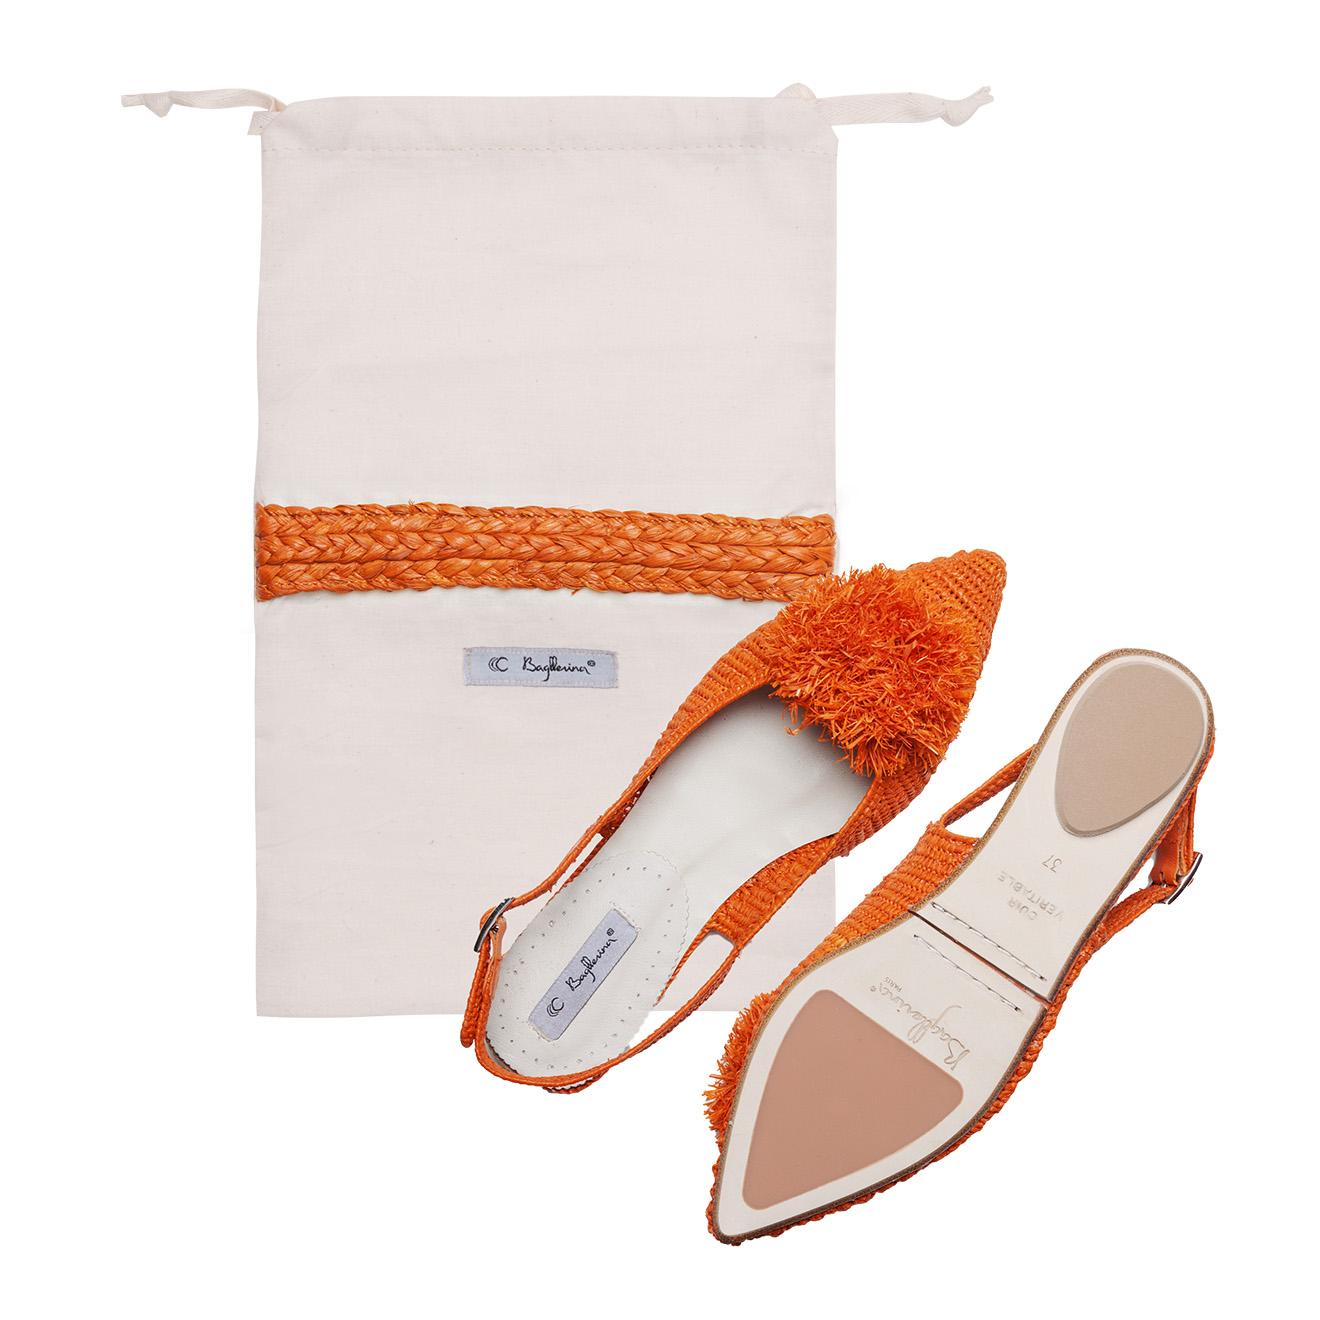 Sandales pliables Raphia Orange de Sicile